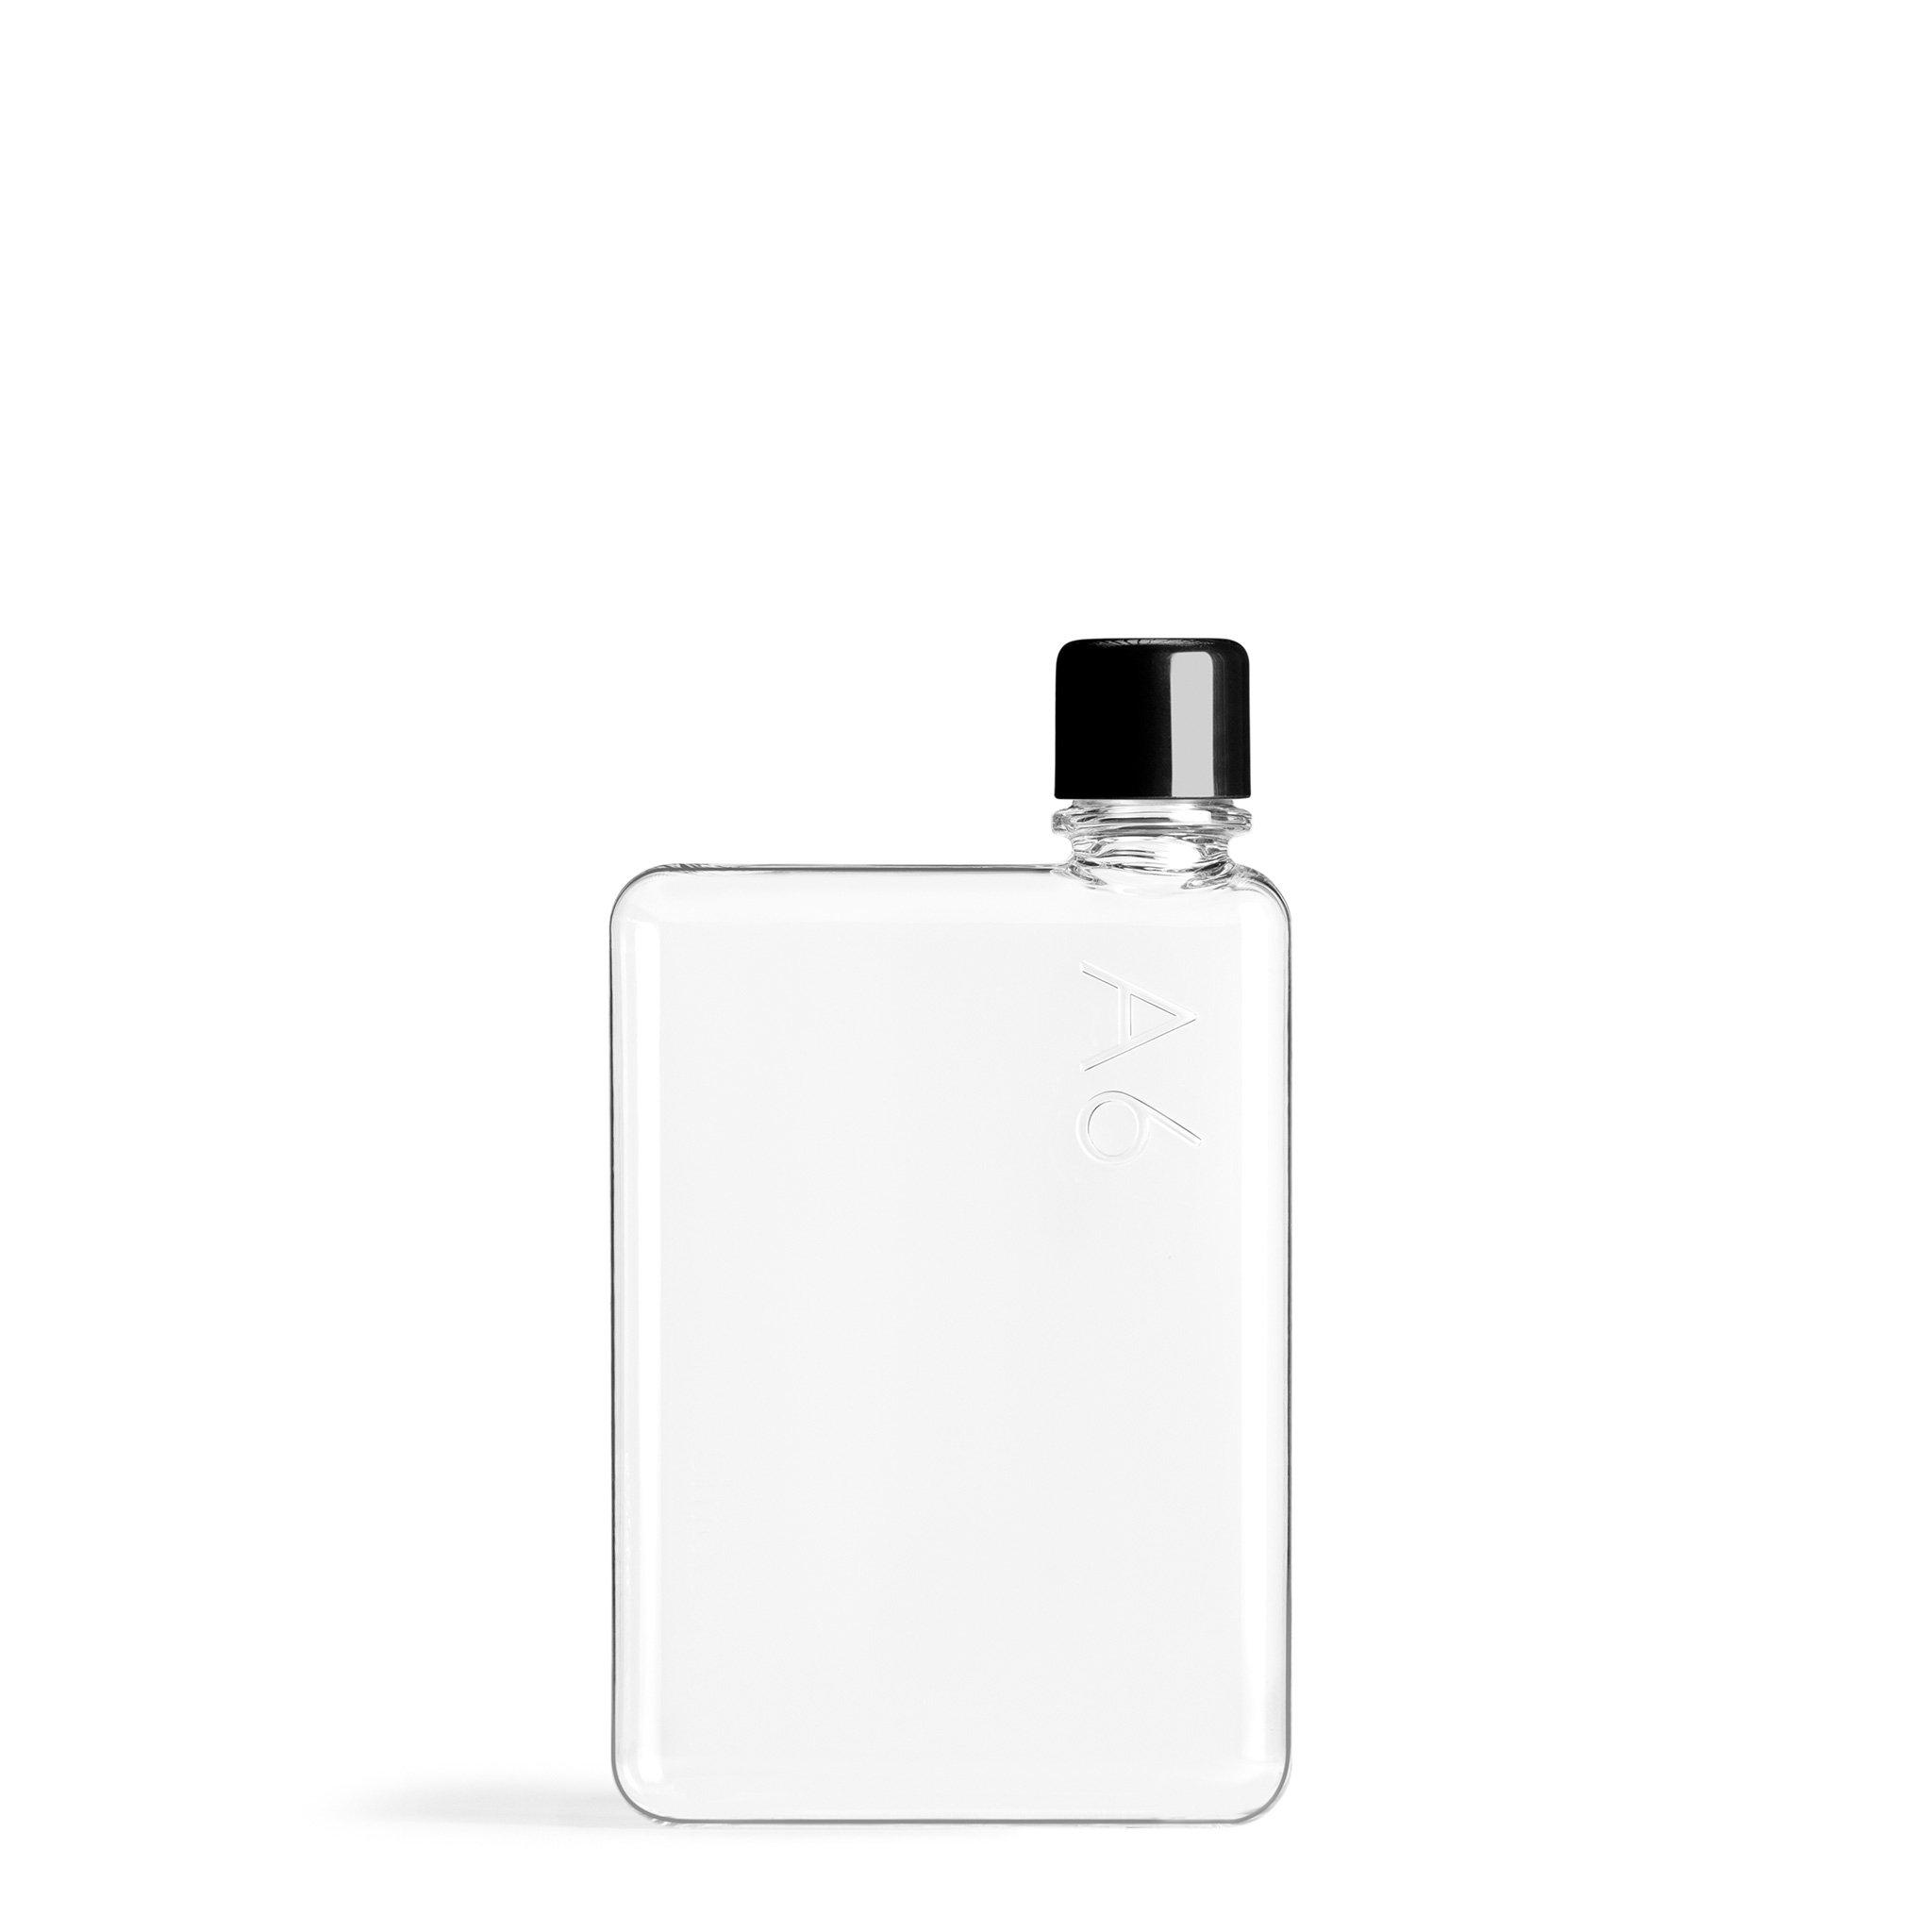 Botella_memmobottle A6